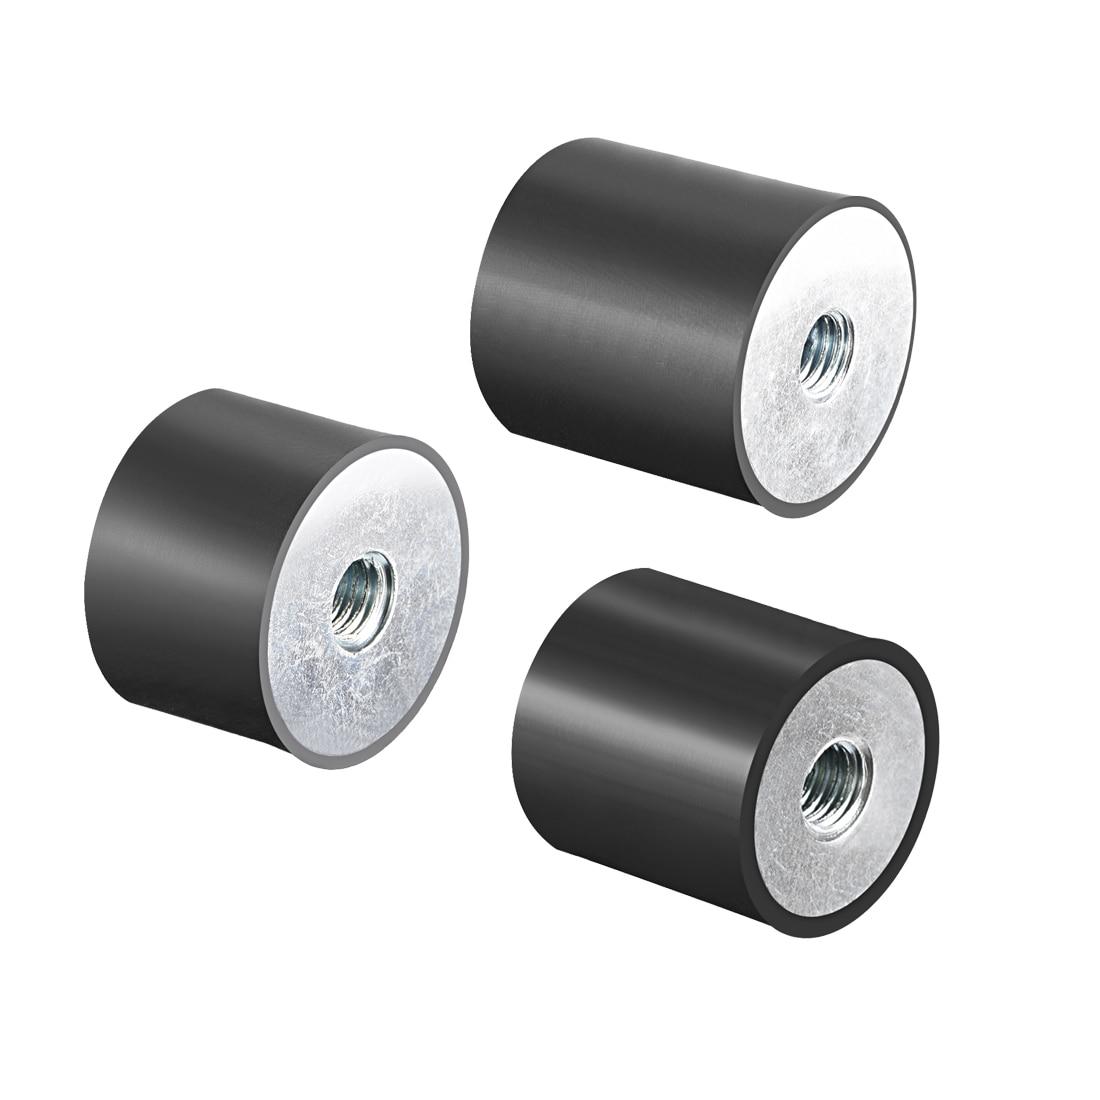 Uxcell M6 M8 M10 Female Thread Rubber Mounts Vibration Isolator Replaces Anti Vibration Pads Flat Silentblock Base Block